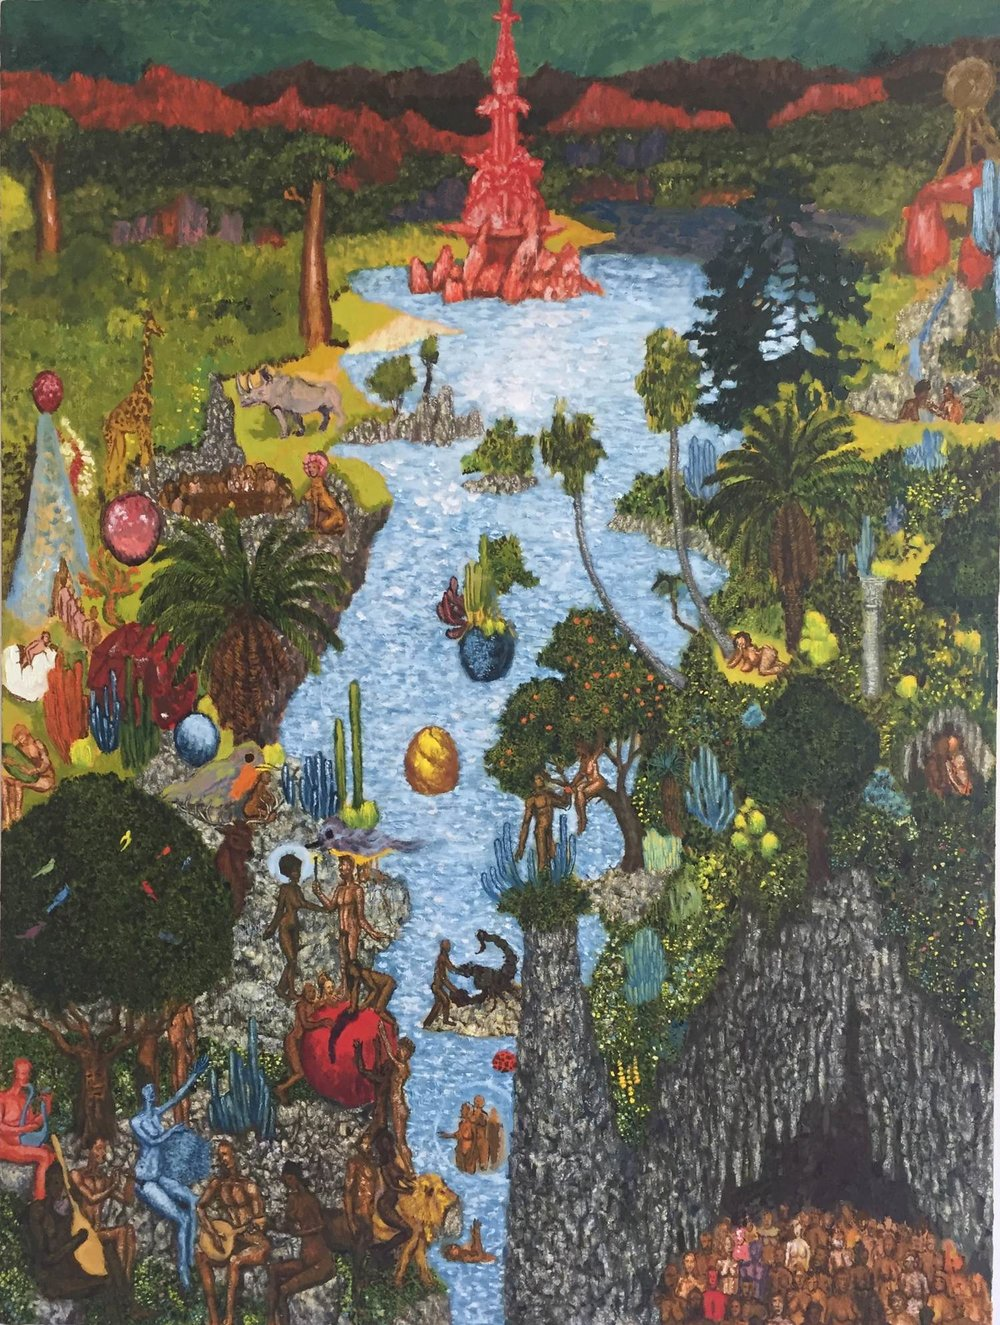 Garden of Earthly Delights, 2016